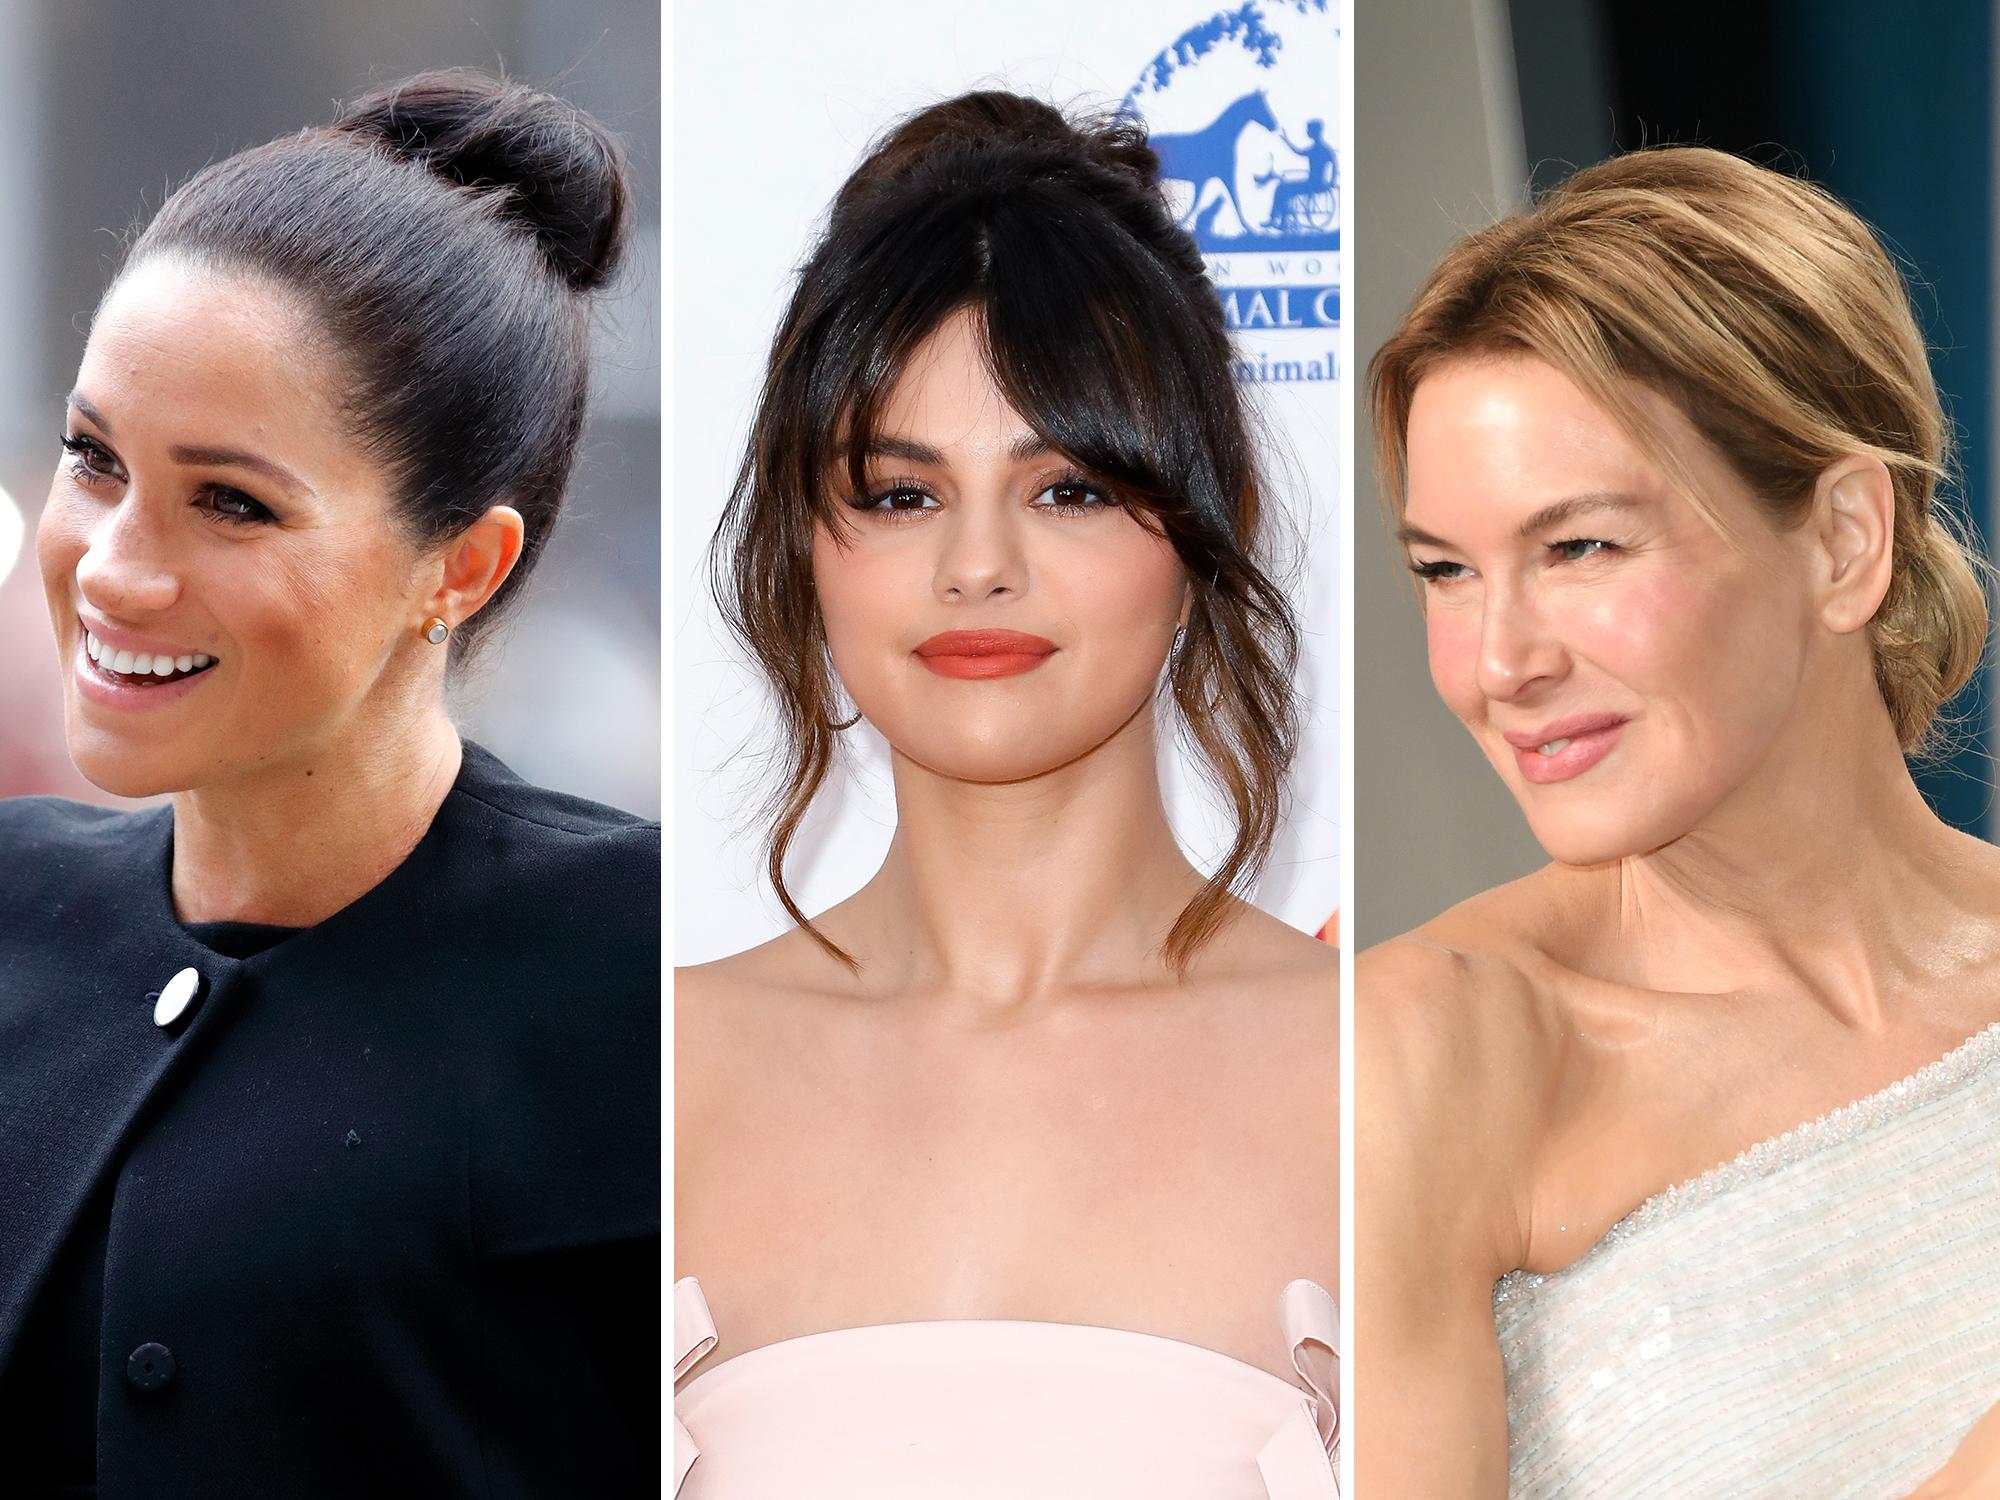 7 super cute hairstyles for long hair girls!